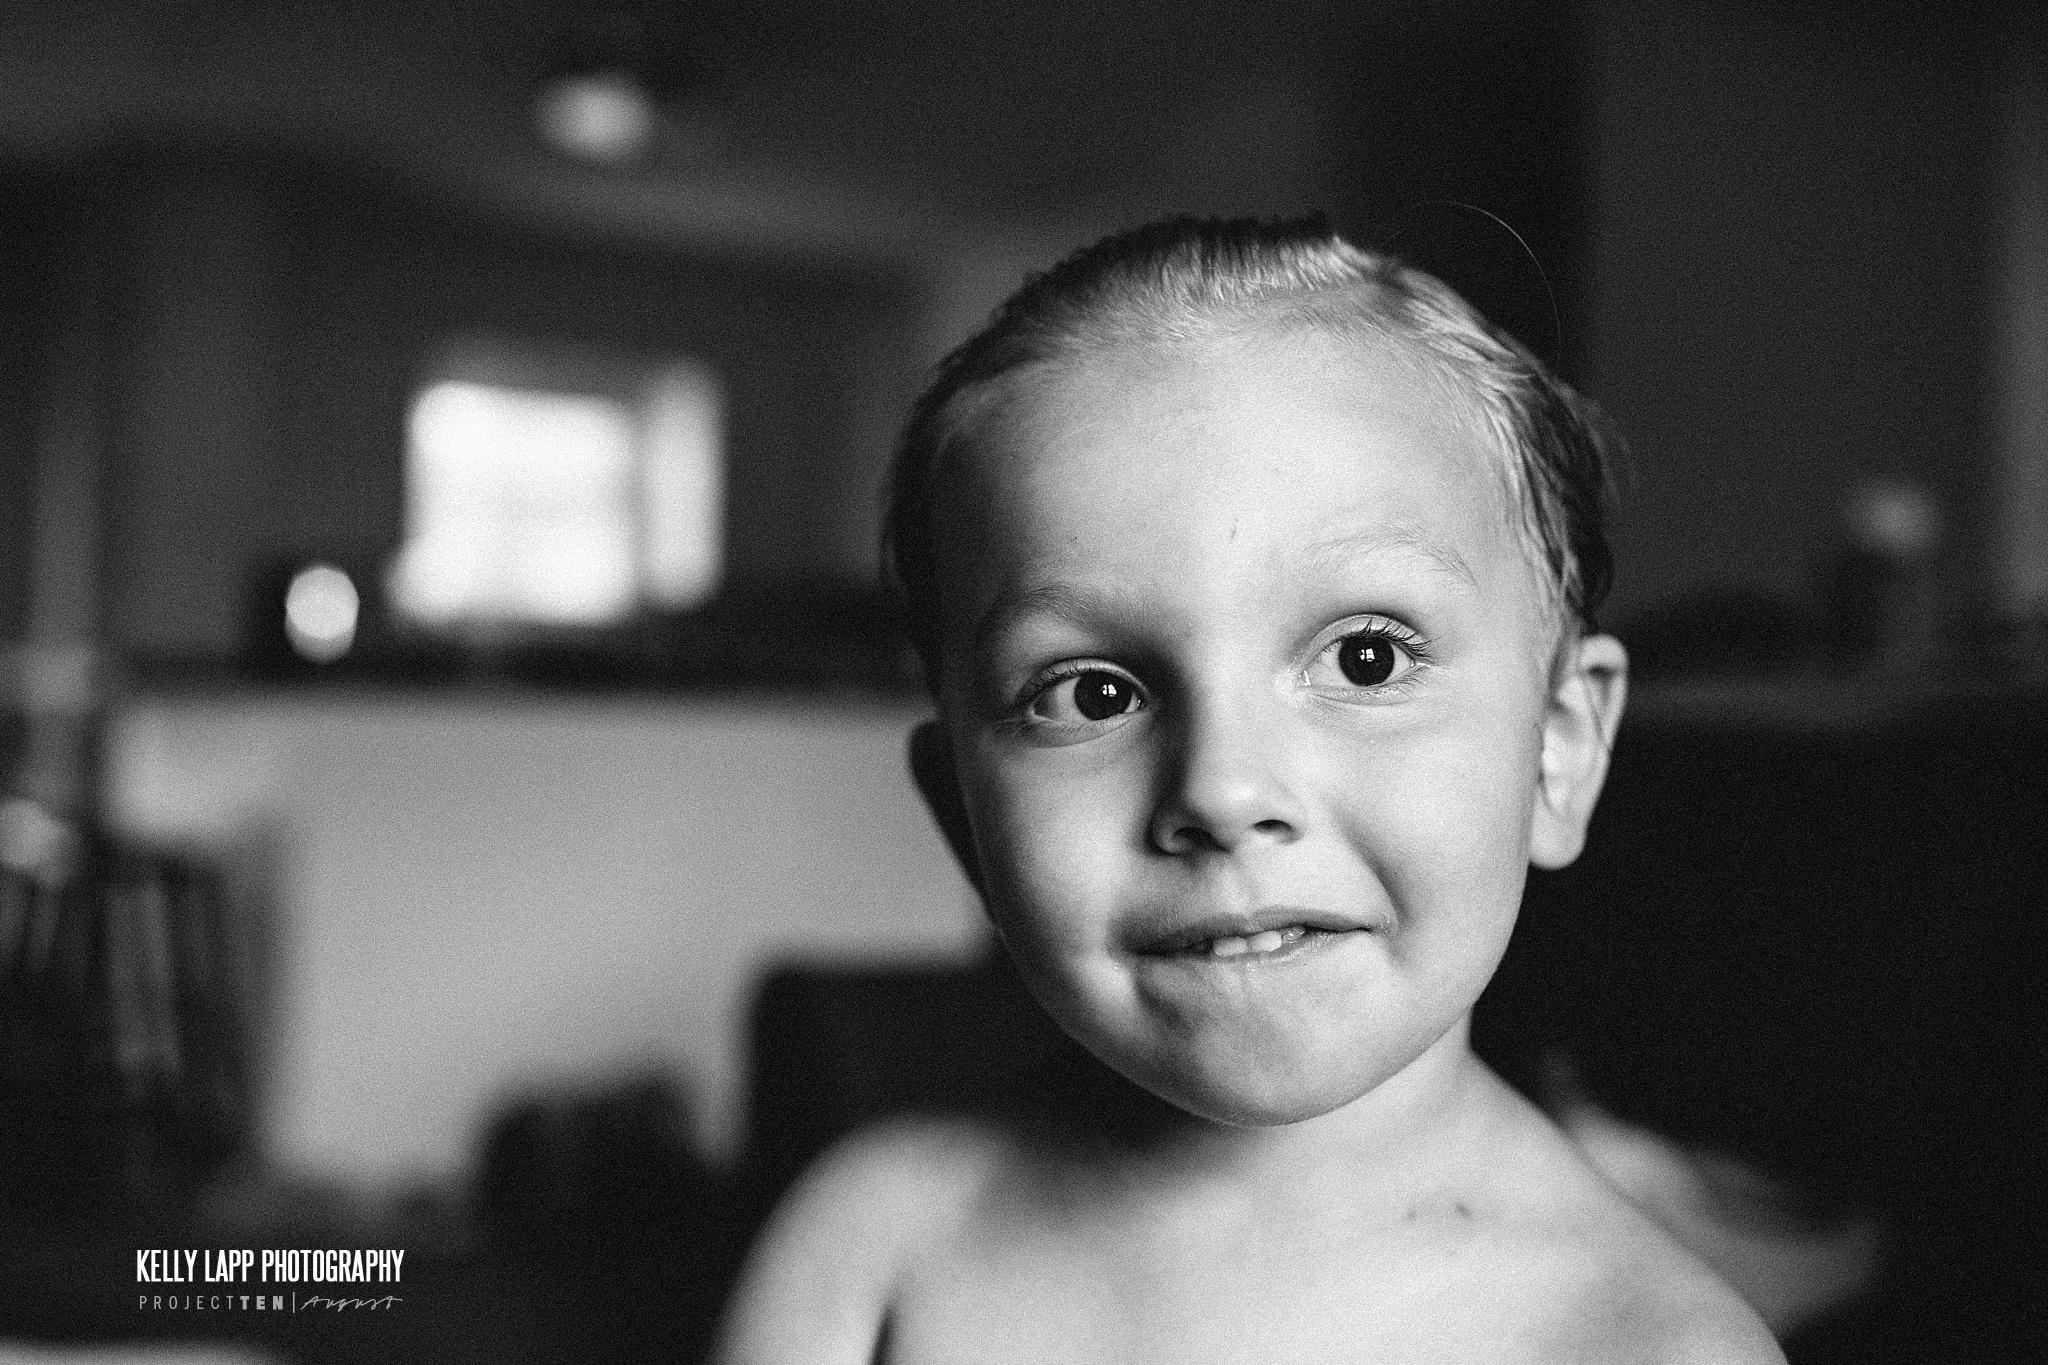 KellyLappPhotography_familyphotojournalism_projectten_august2017_12.JPG